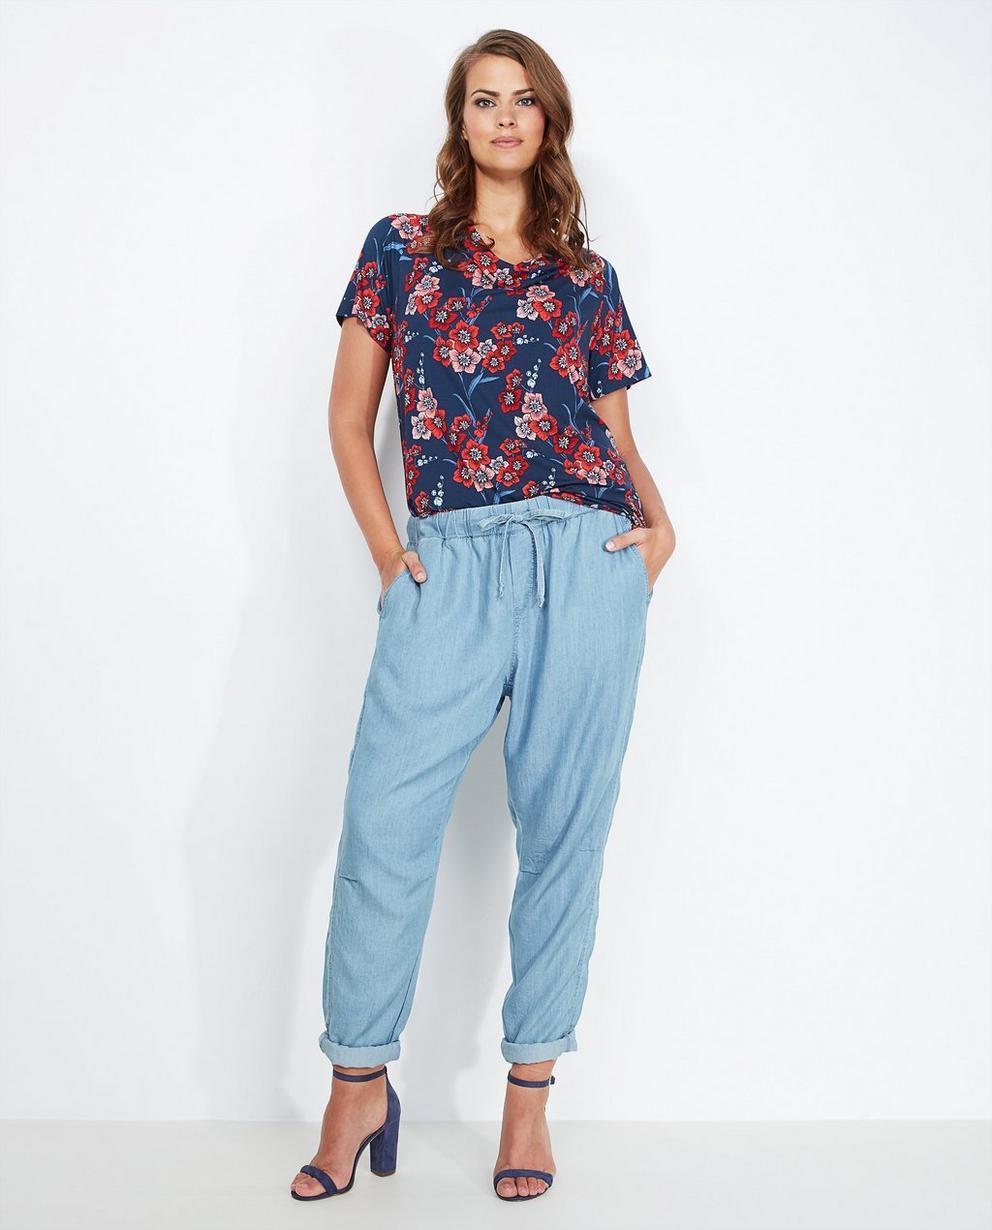 Jeans bleu clair souple - lyocell doux - Lena Lena